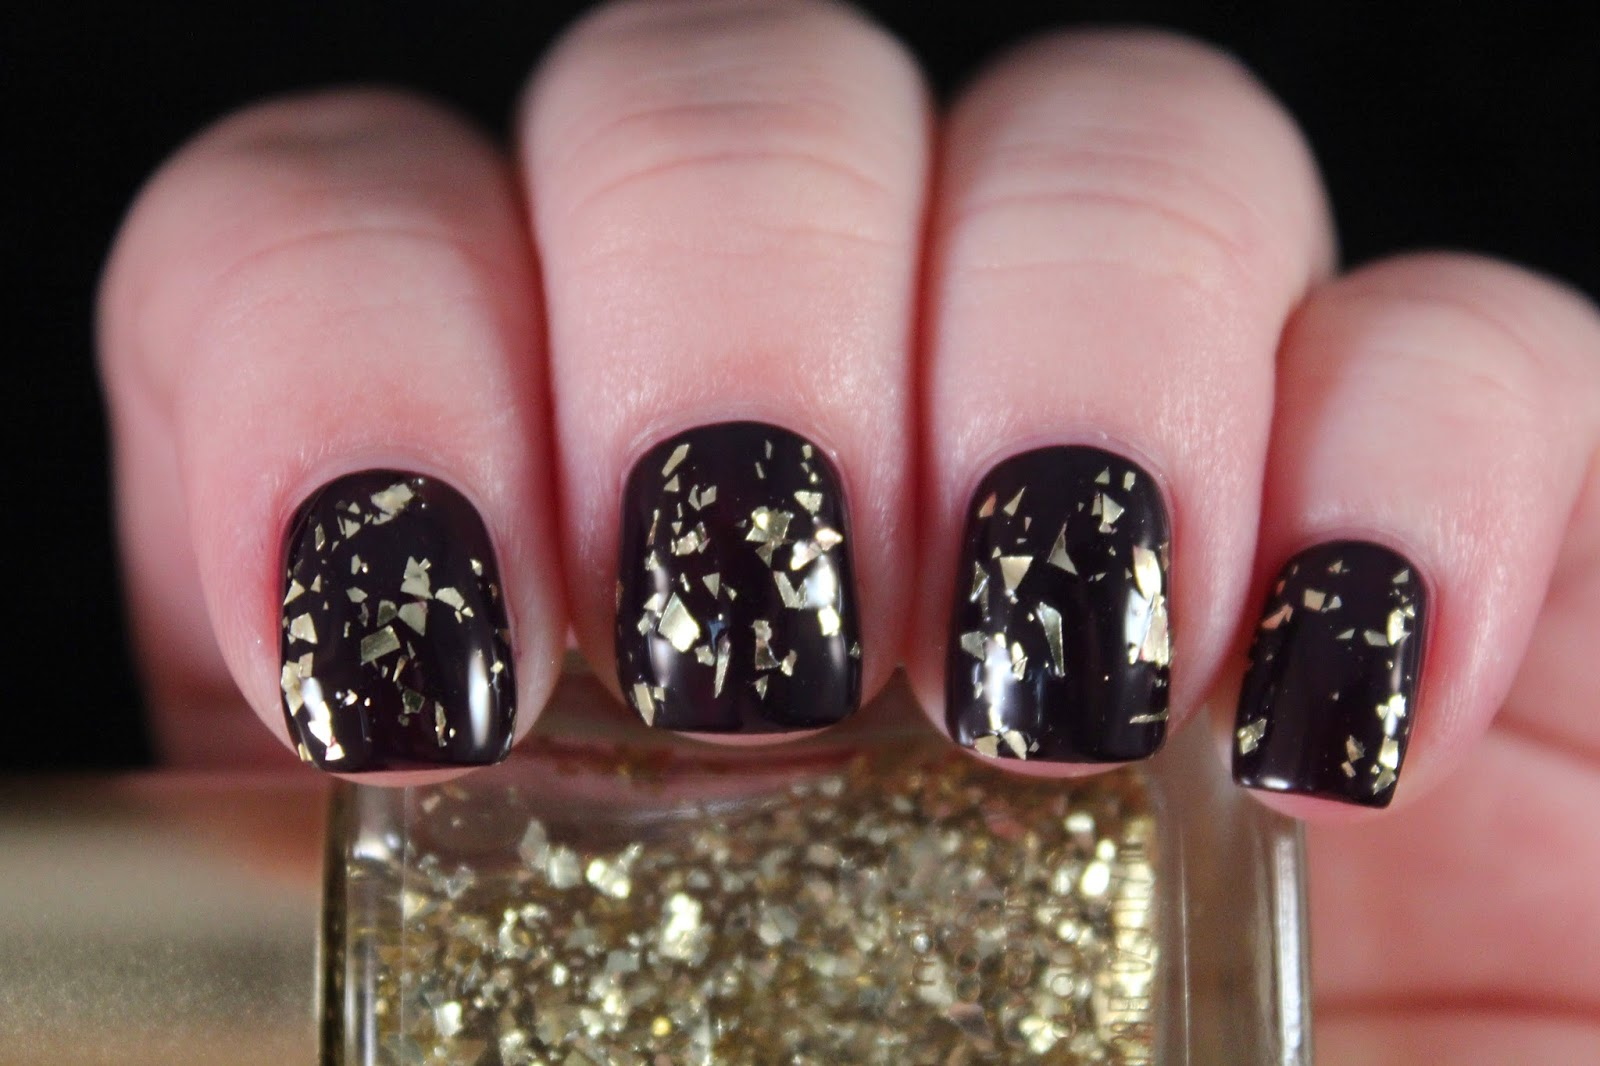 Loreal Black Glitter Nail Polish - To Bend Light